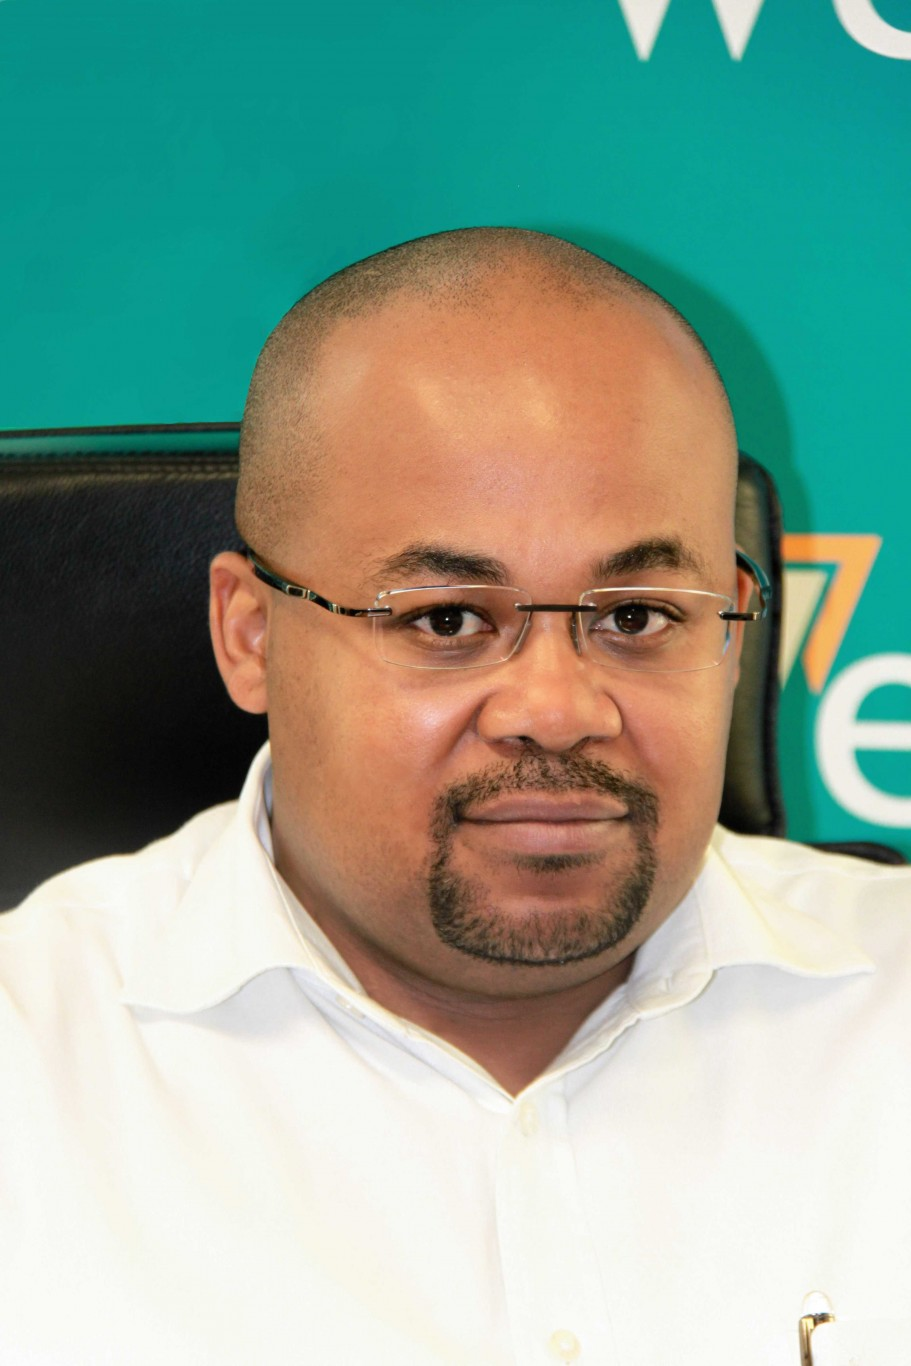 Simphiwe Nghona, CEO of WesBank Motor Retail